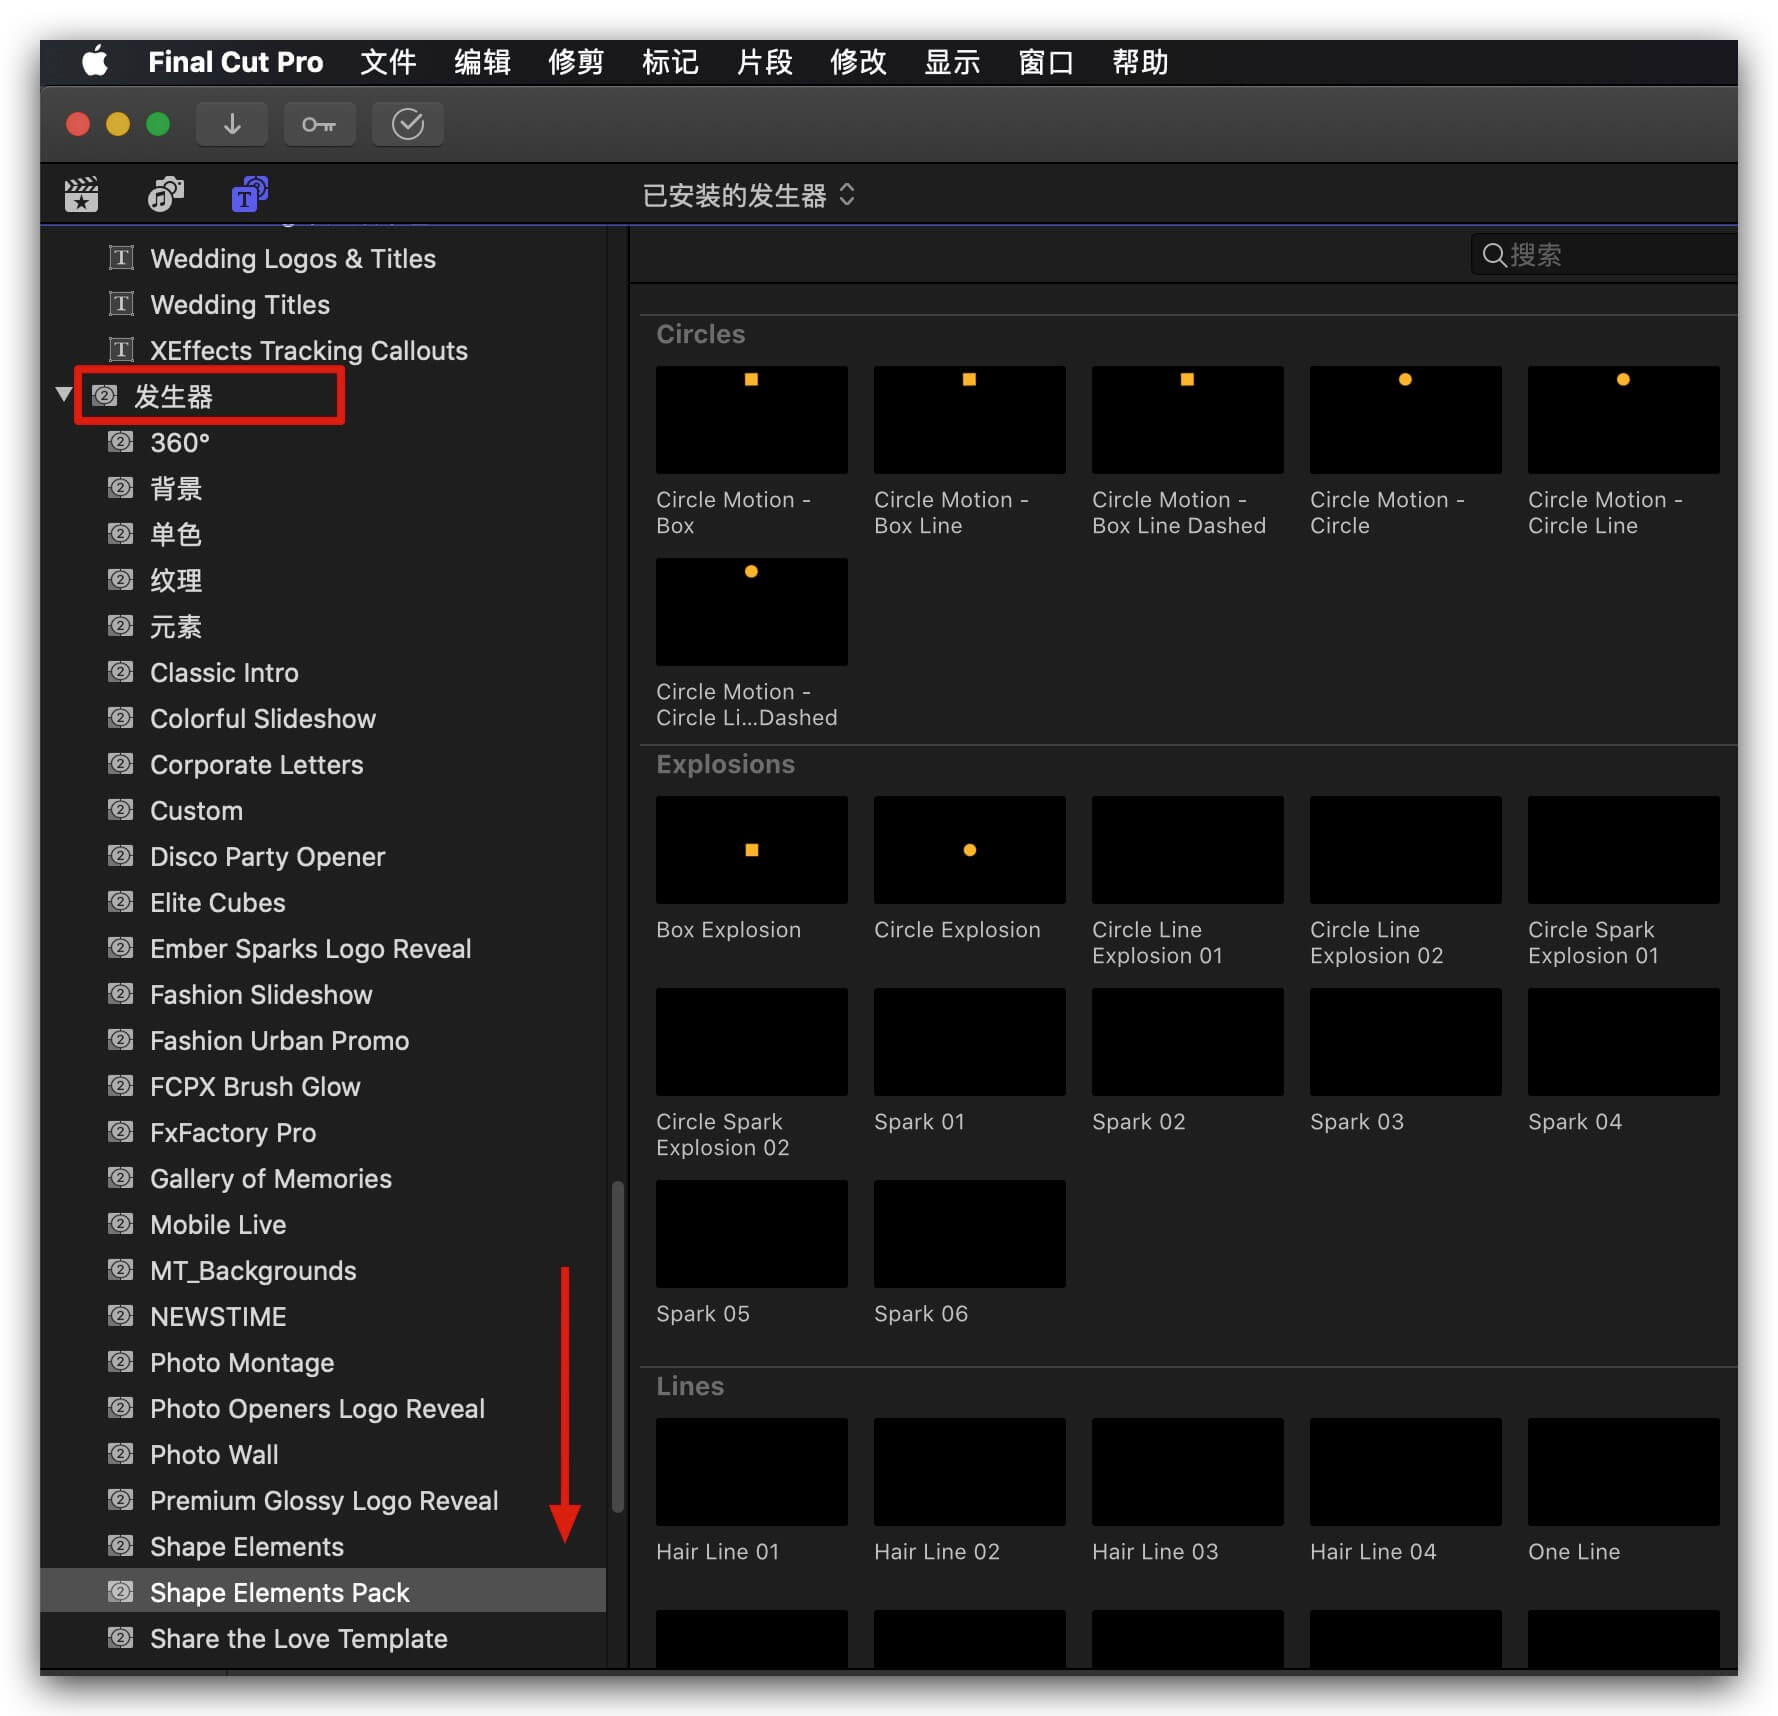 fcpx插件 影片装饰图形运动小元素线条圆圈箭头爆炸等 Shape Elements